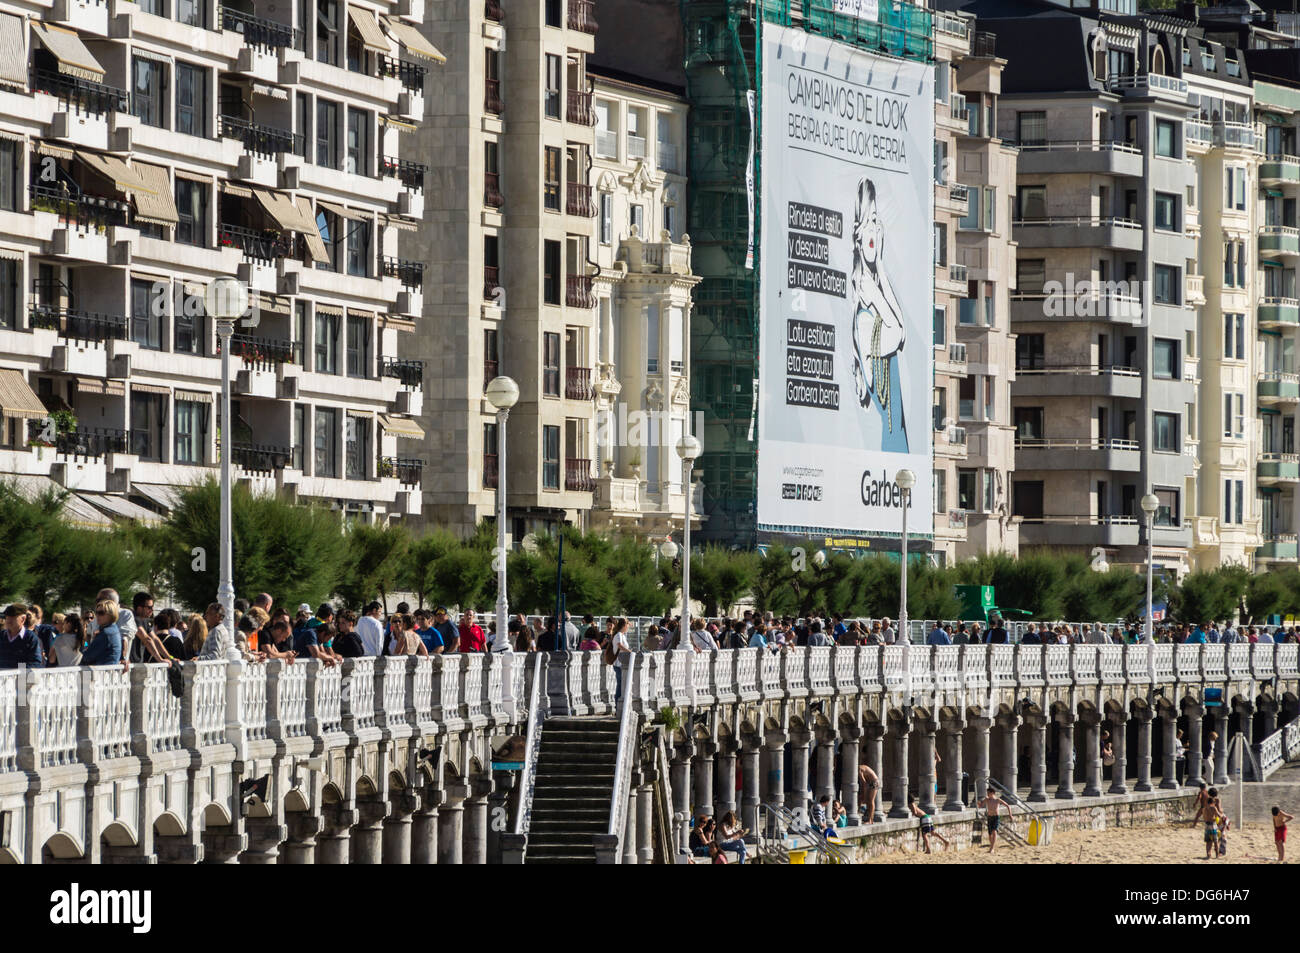 Basque country, Euskadi - San Sebastian. Seafront promenade. Stock Photo